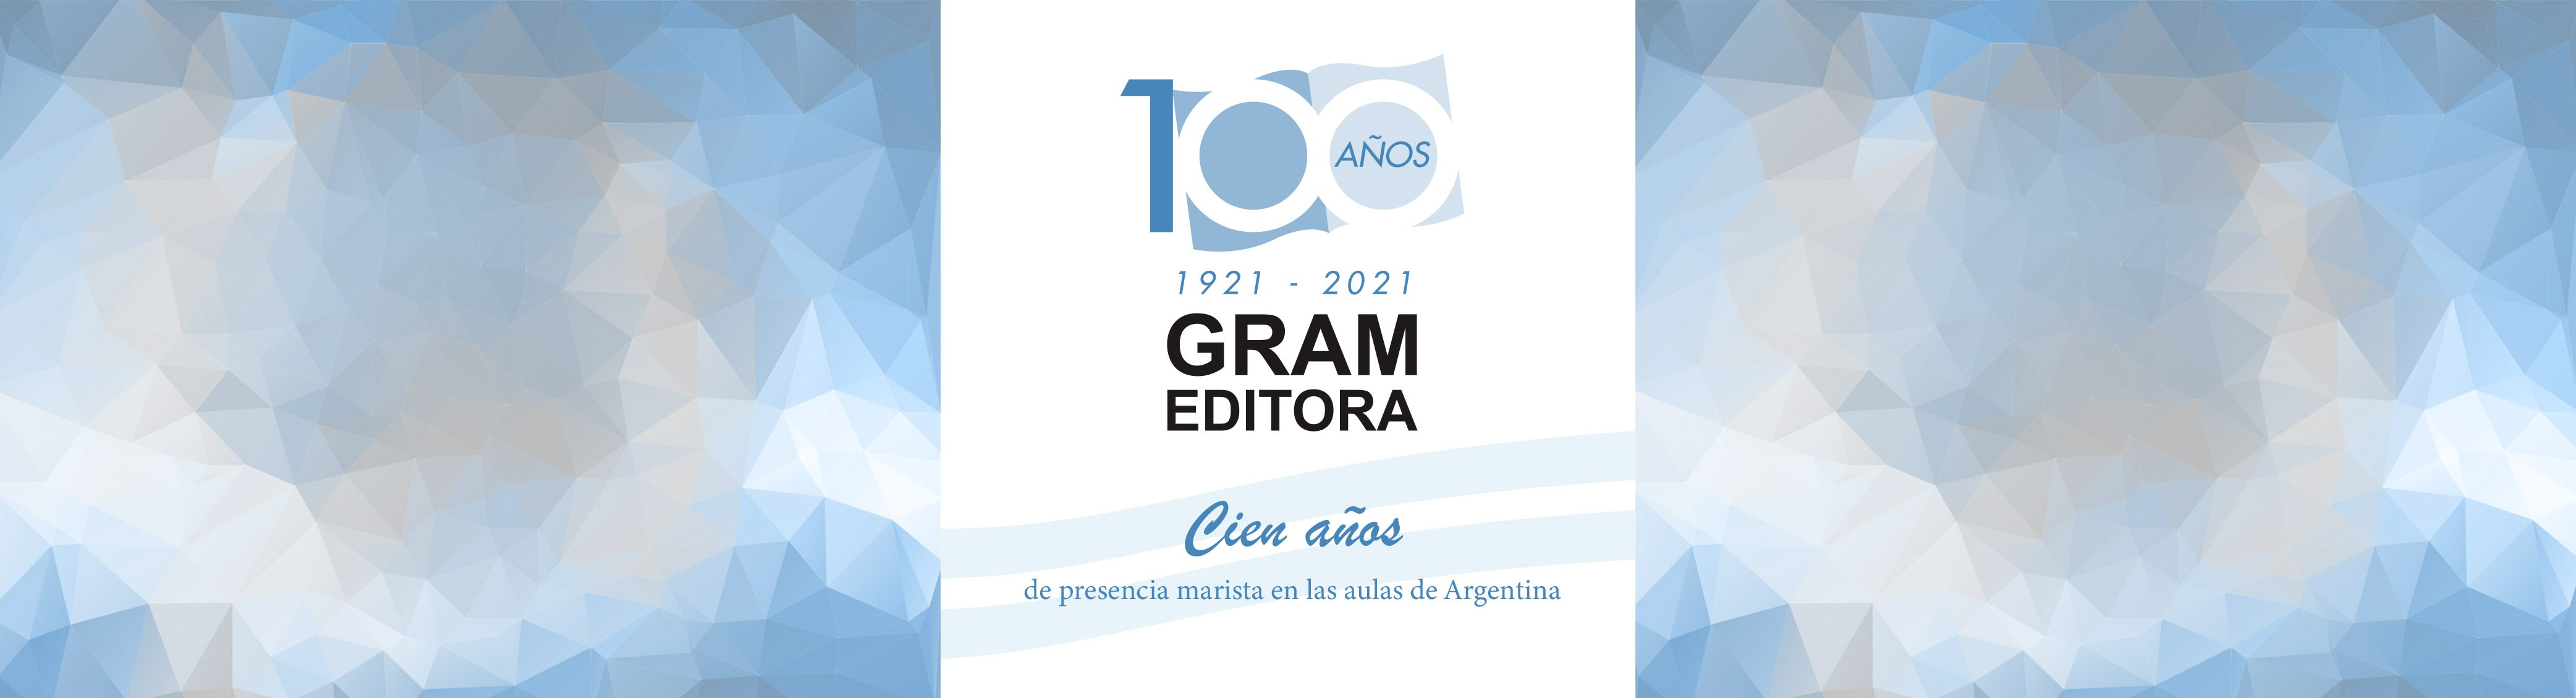 100 anos de historia